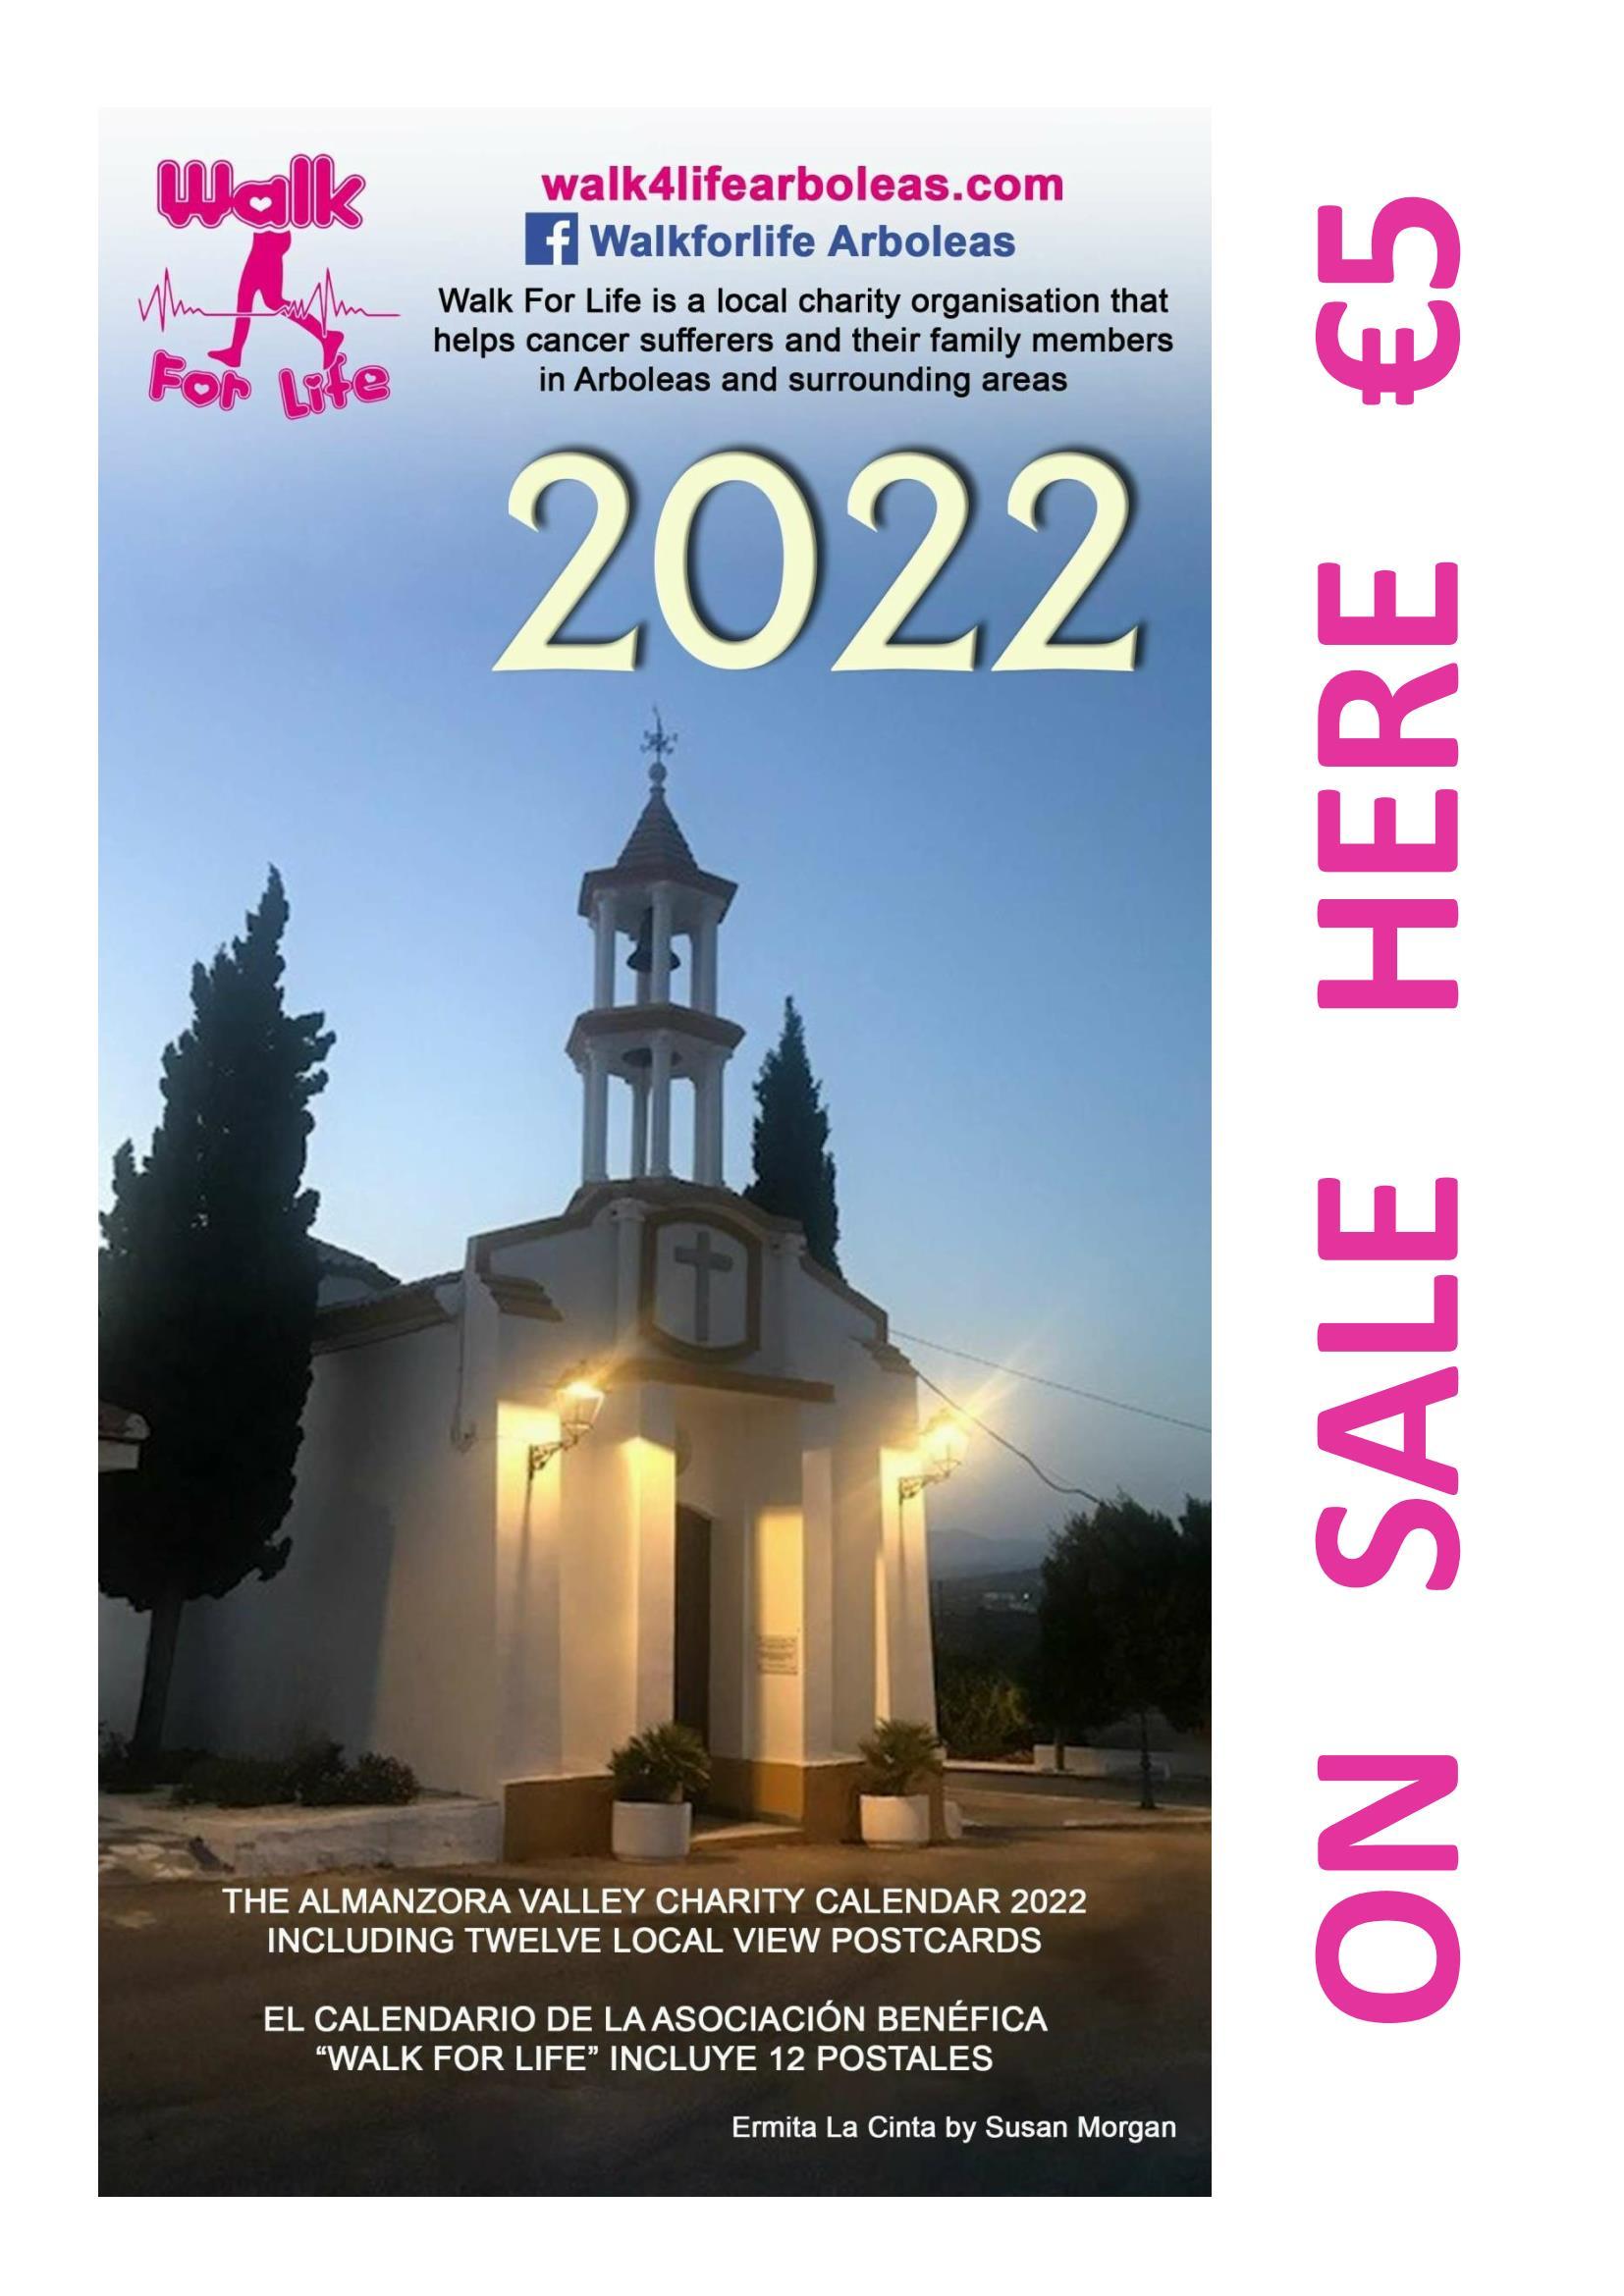 Walk for Life Calendars 2022